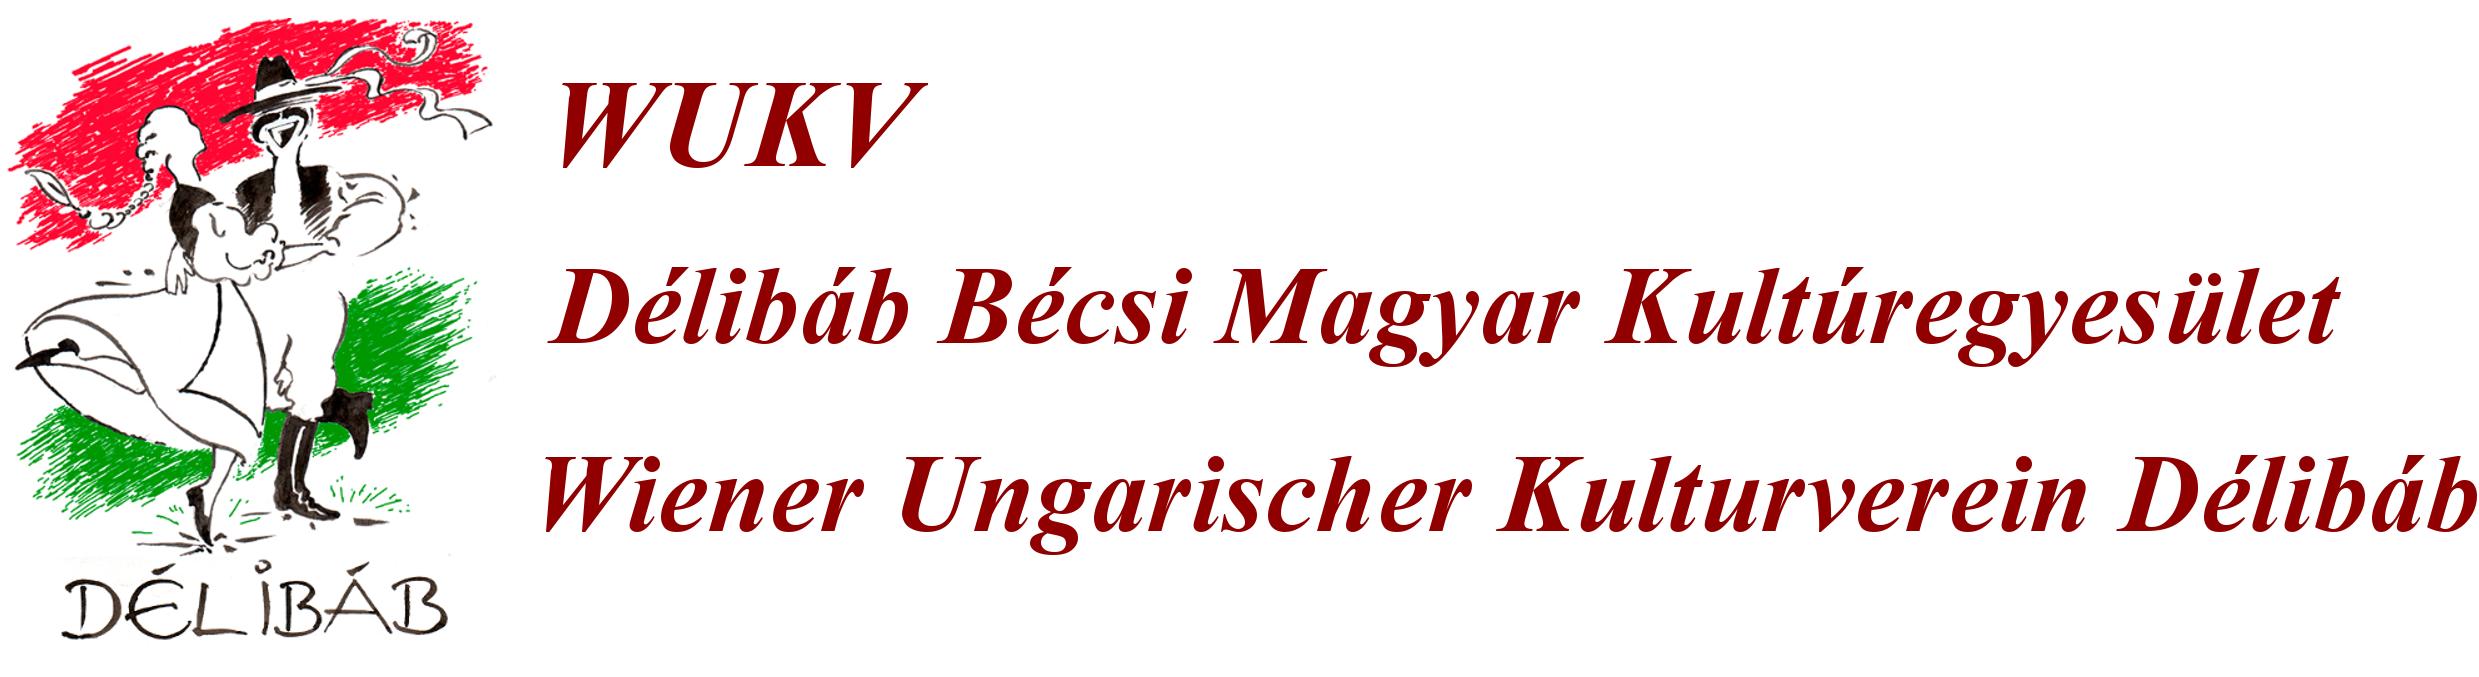 WUKV – Wiener Ungarischer Kulturverein / Bécsi Magyar Kultúregyesület